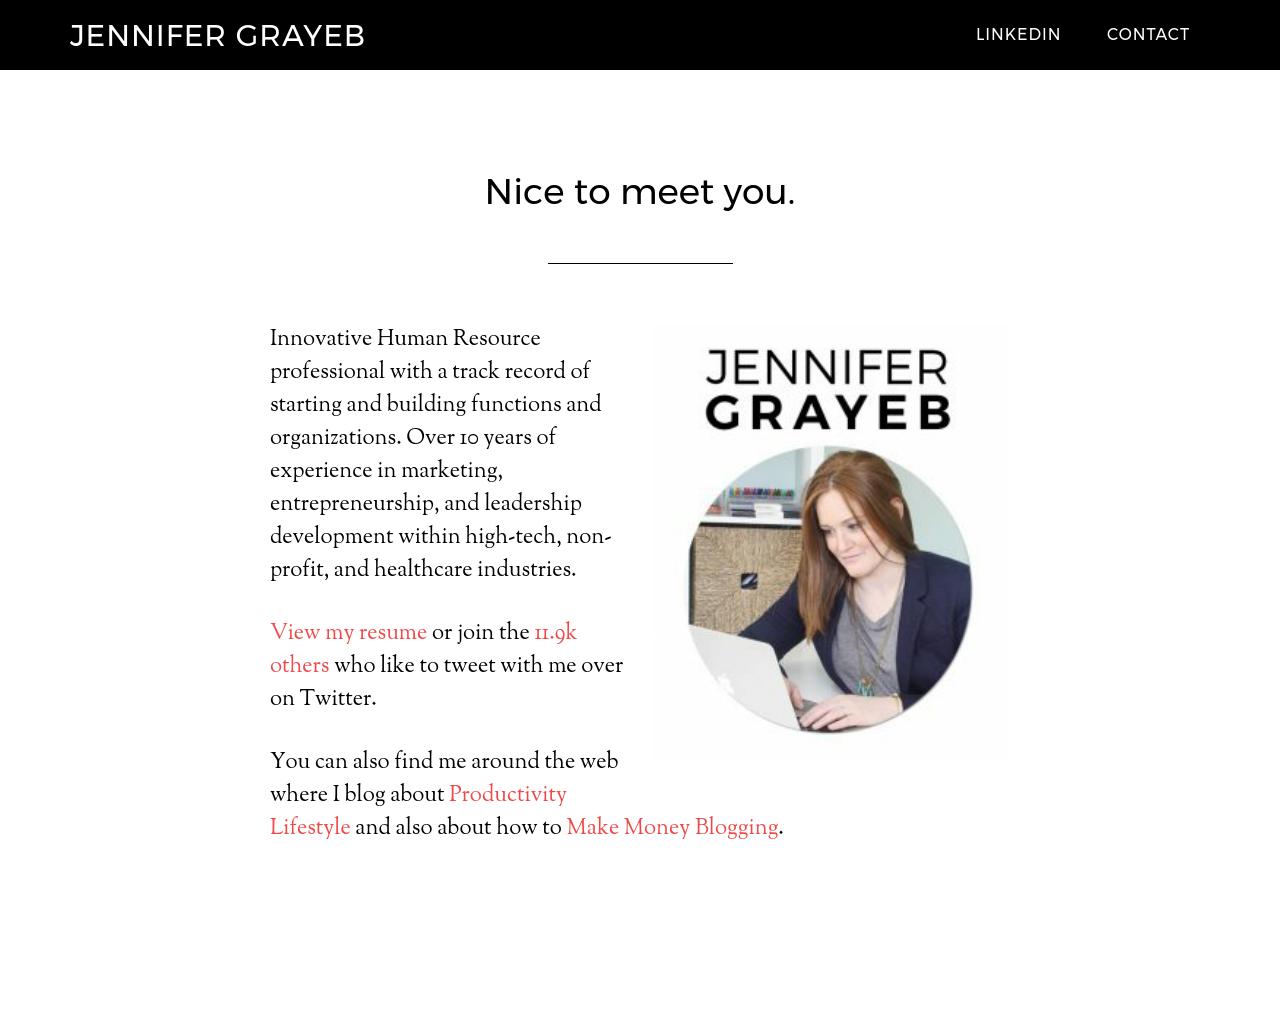 Jennifer-Grayeb-Advertising-Reviews-Pricing